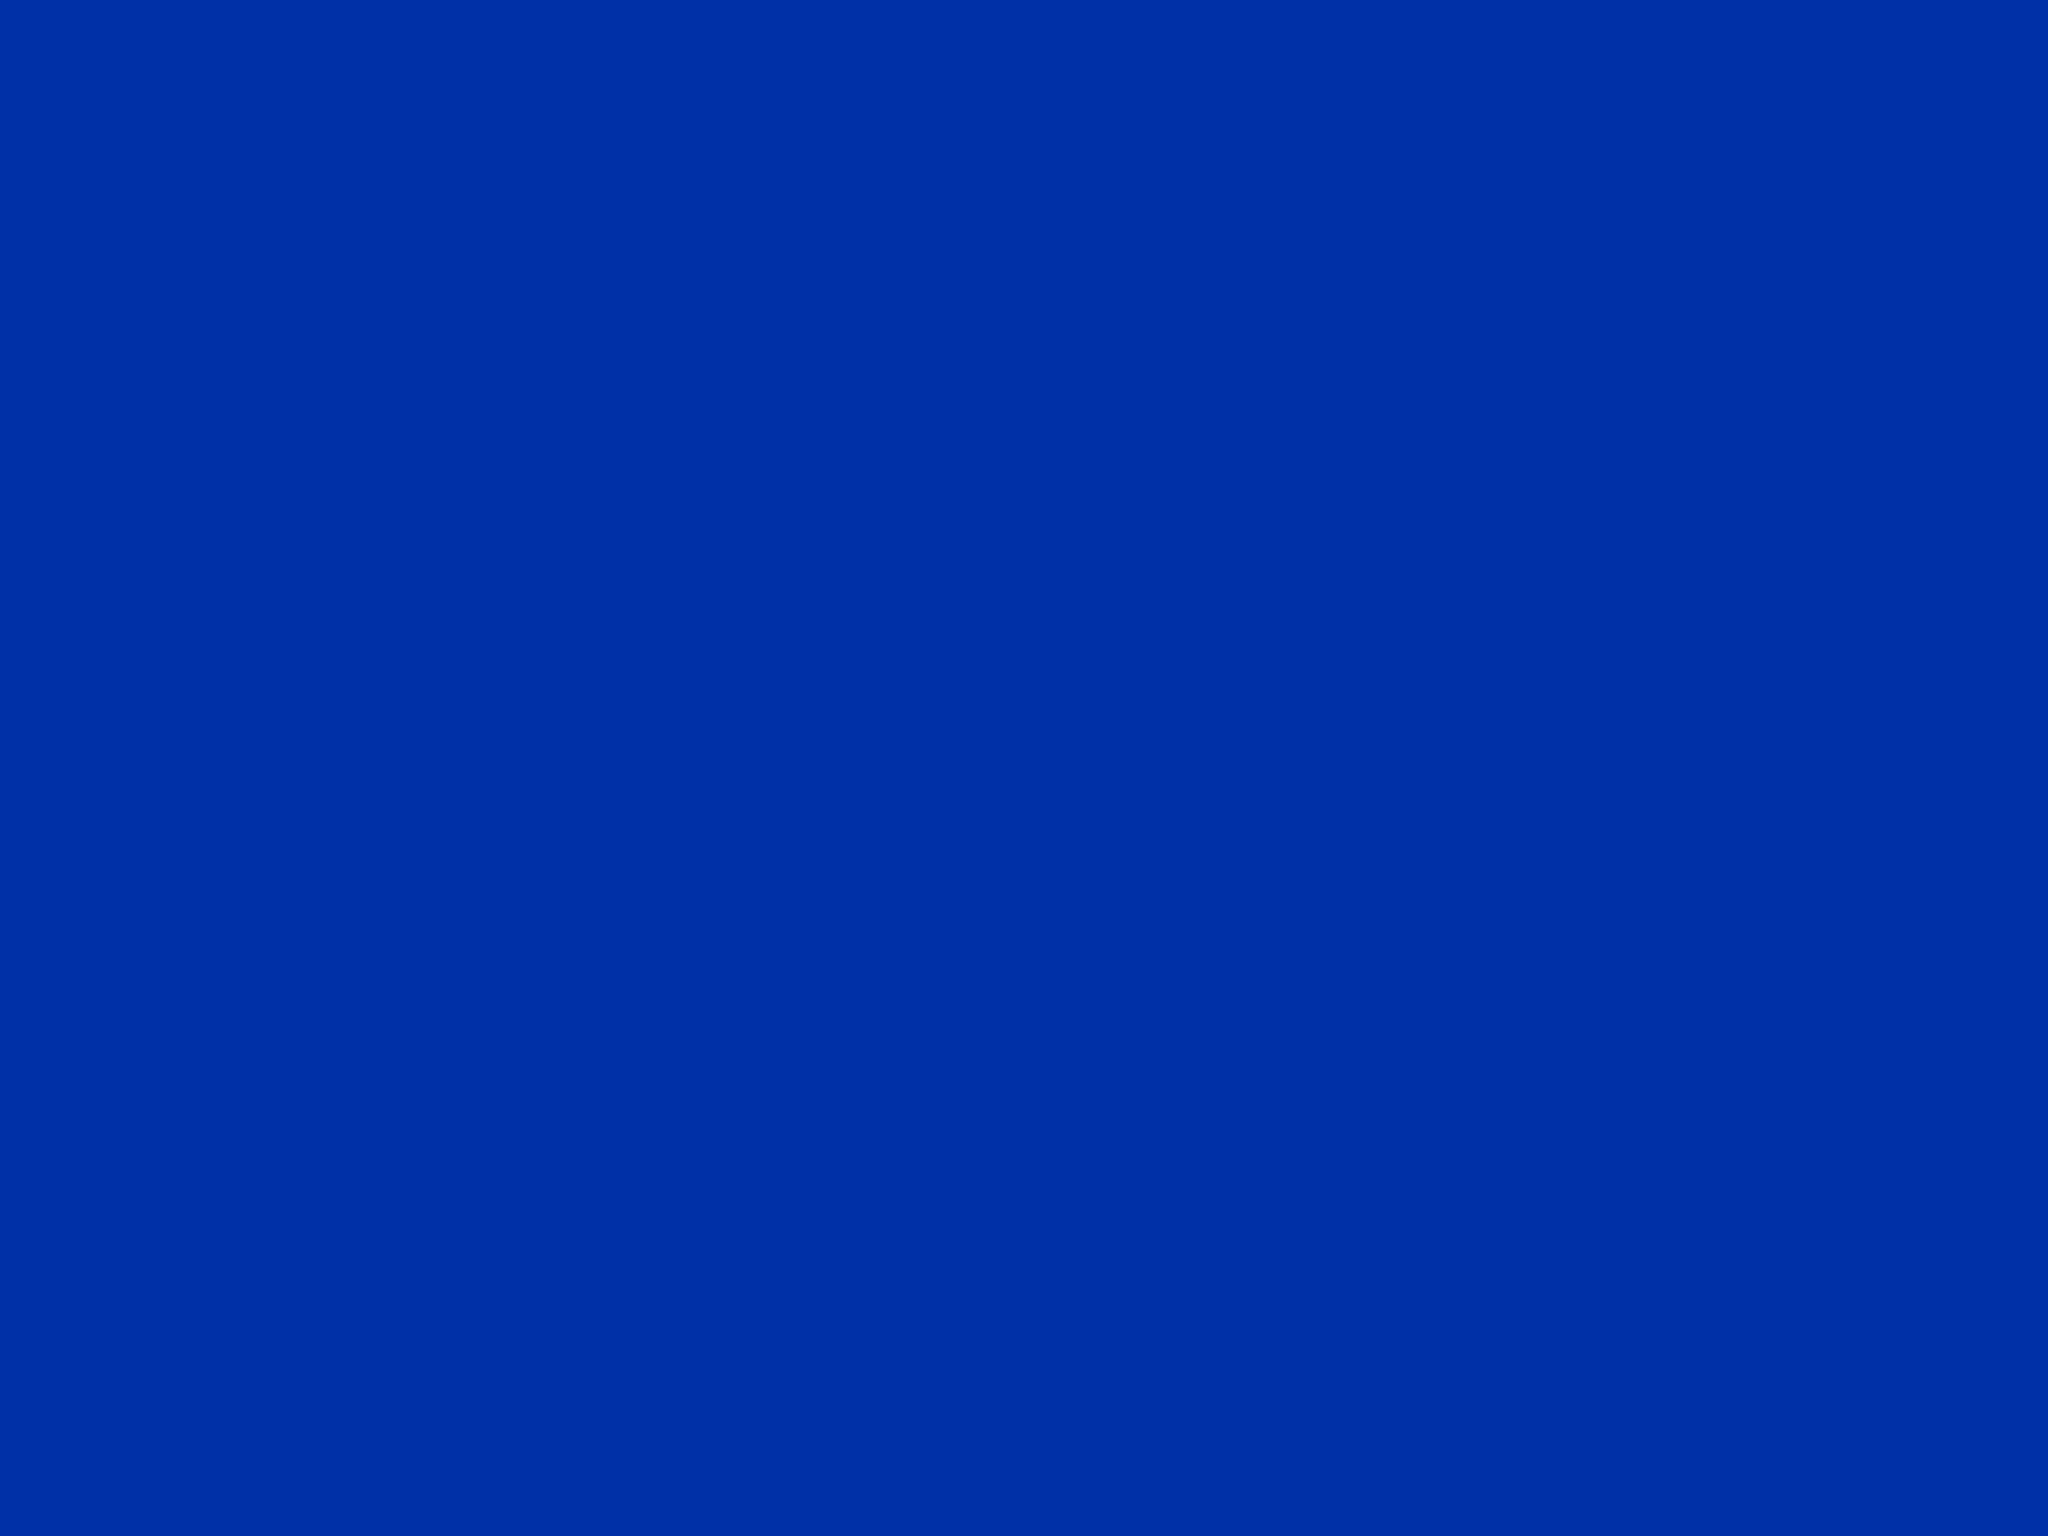 2048x1536 International Klein Blue Solid Color Background